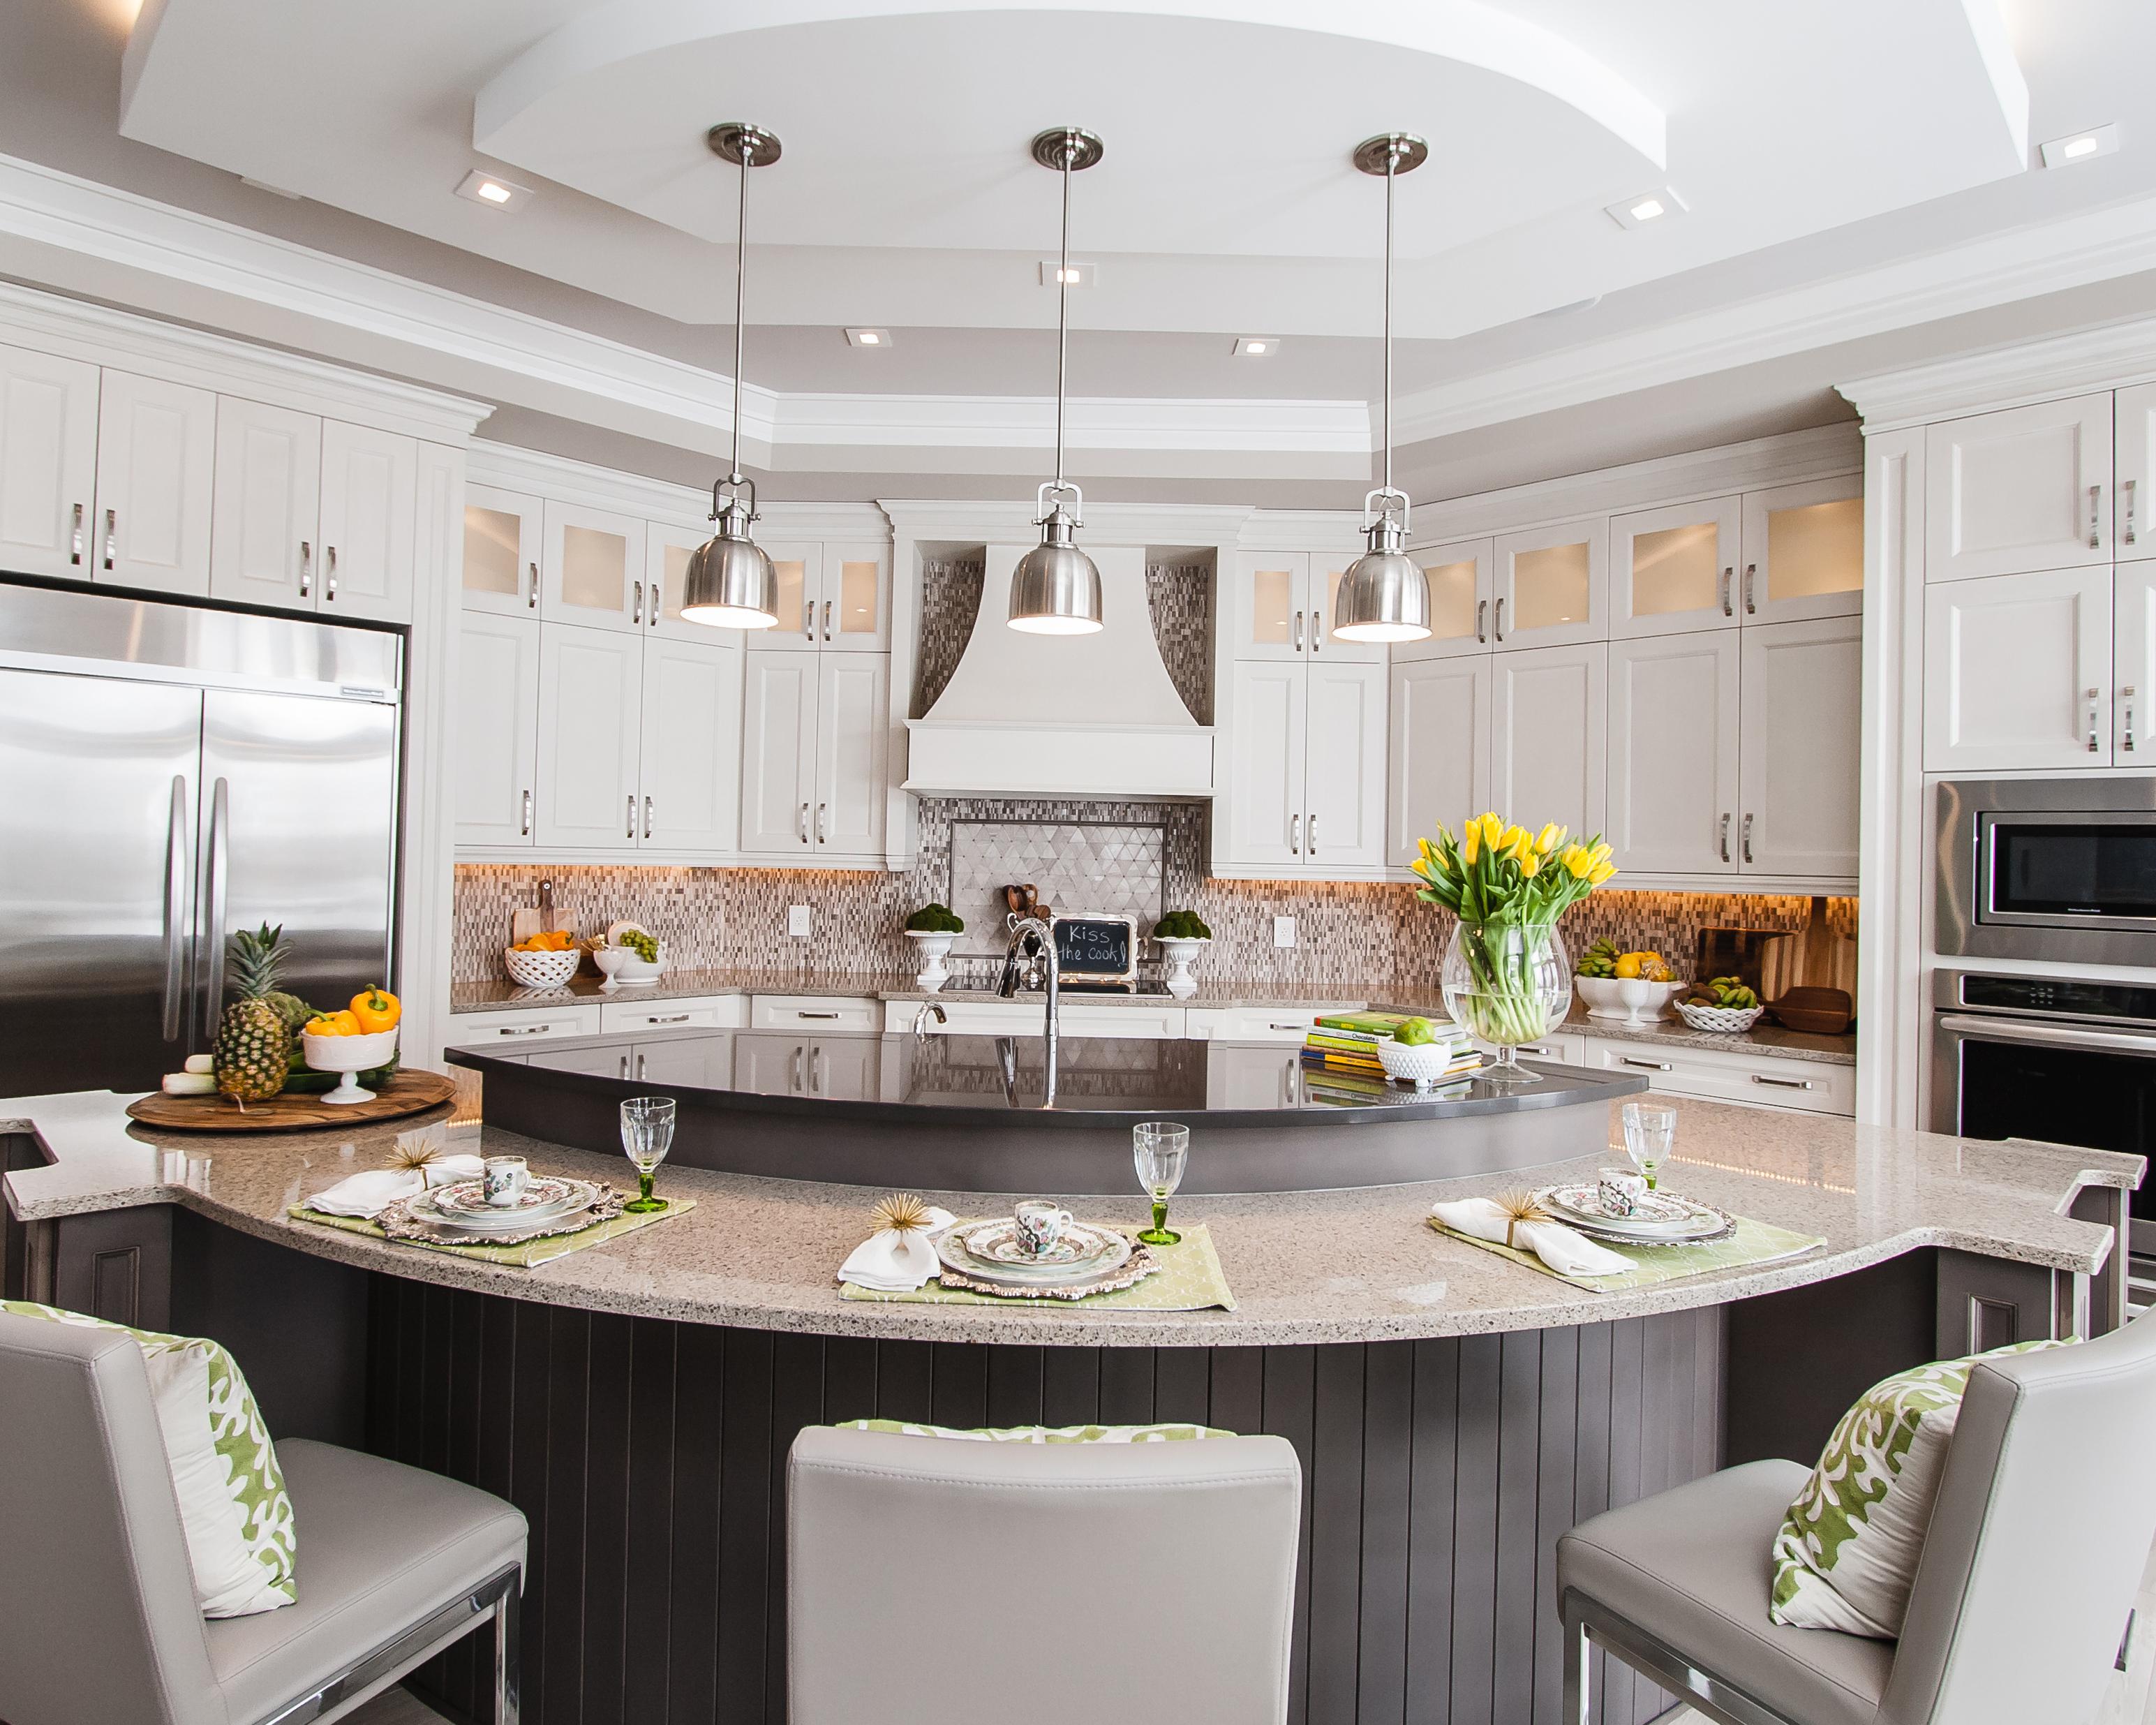 Show Home Decorating Ideas